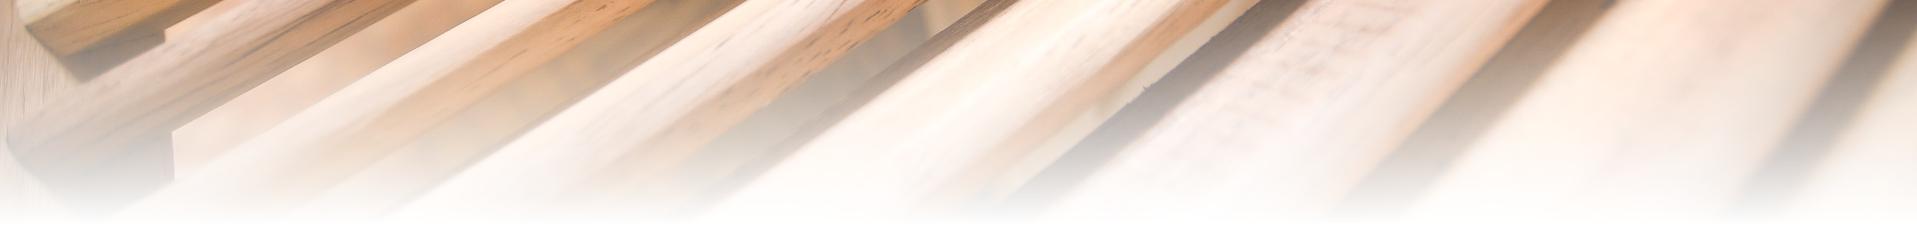 contact menuiserie portes fenêtres sur mesure calvados